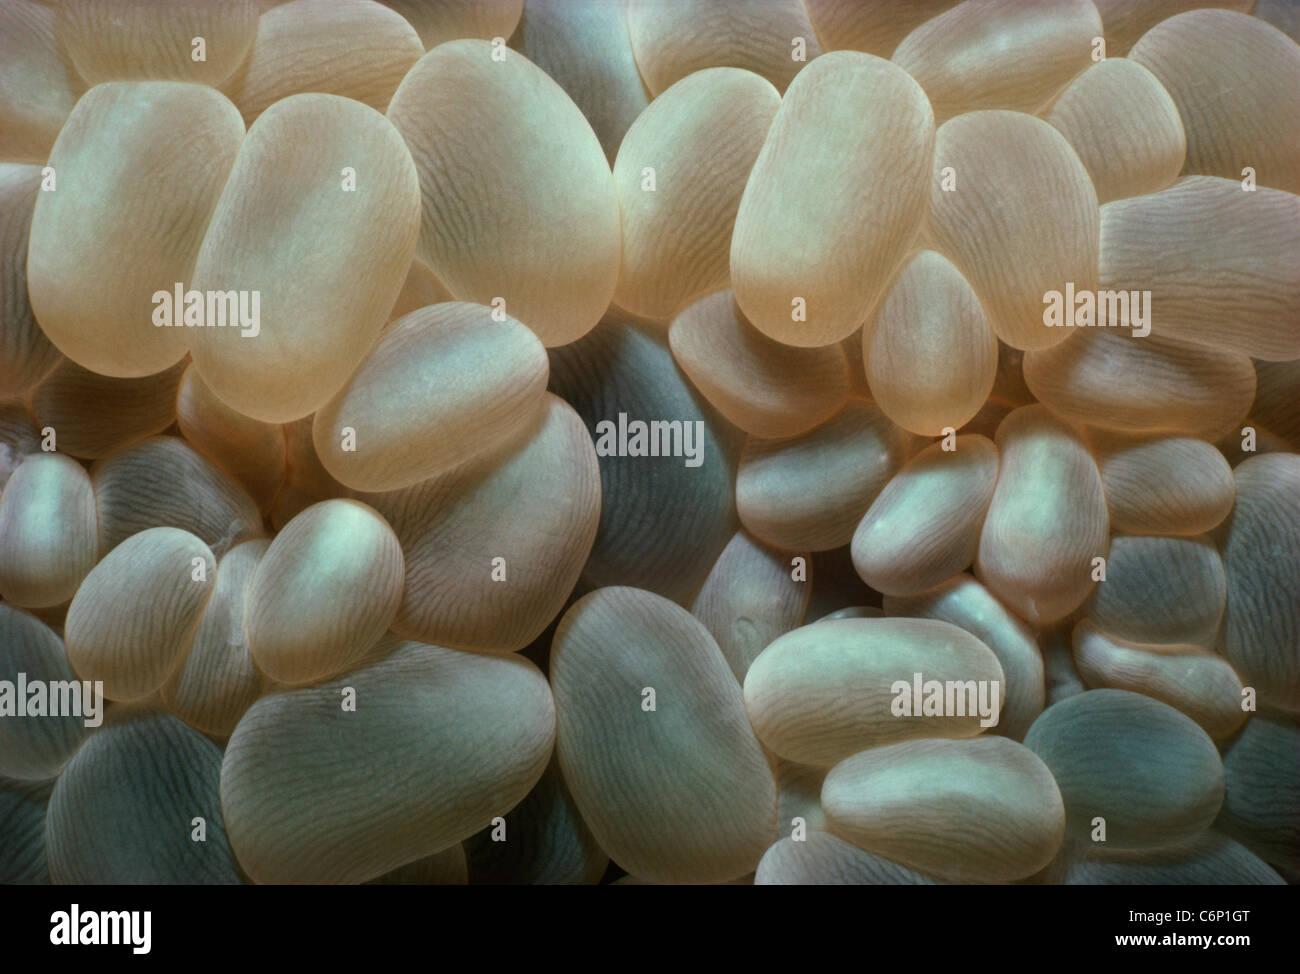 Plerogyra sinuosa Corail (bulle). Mer Rouge, Egypte Photo Stock